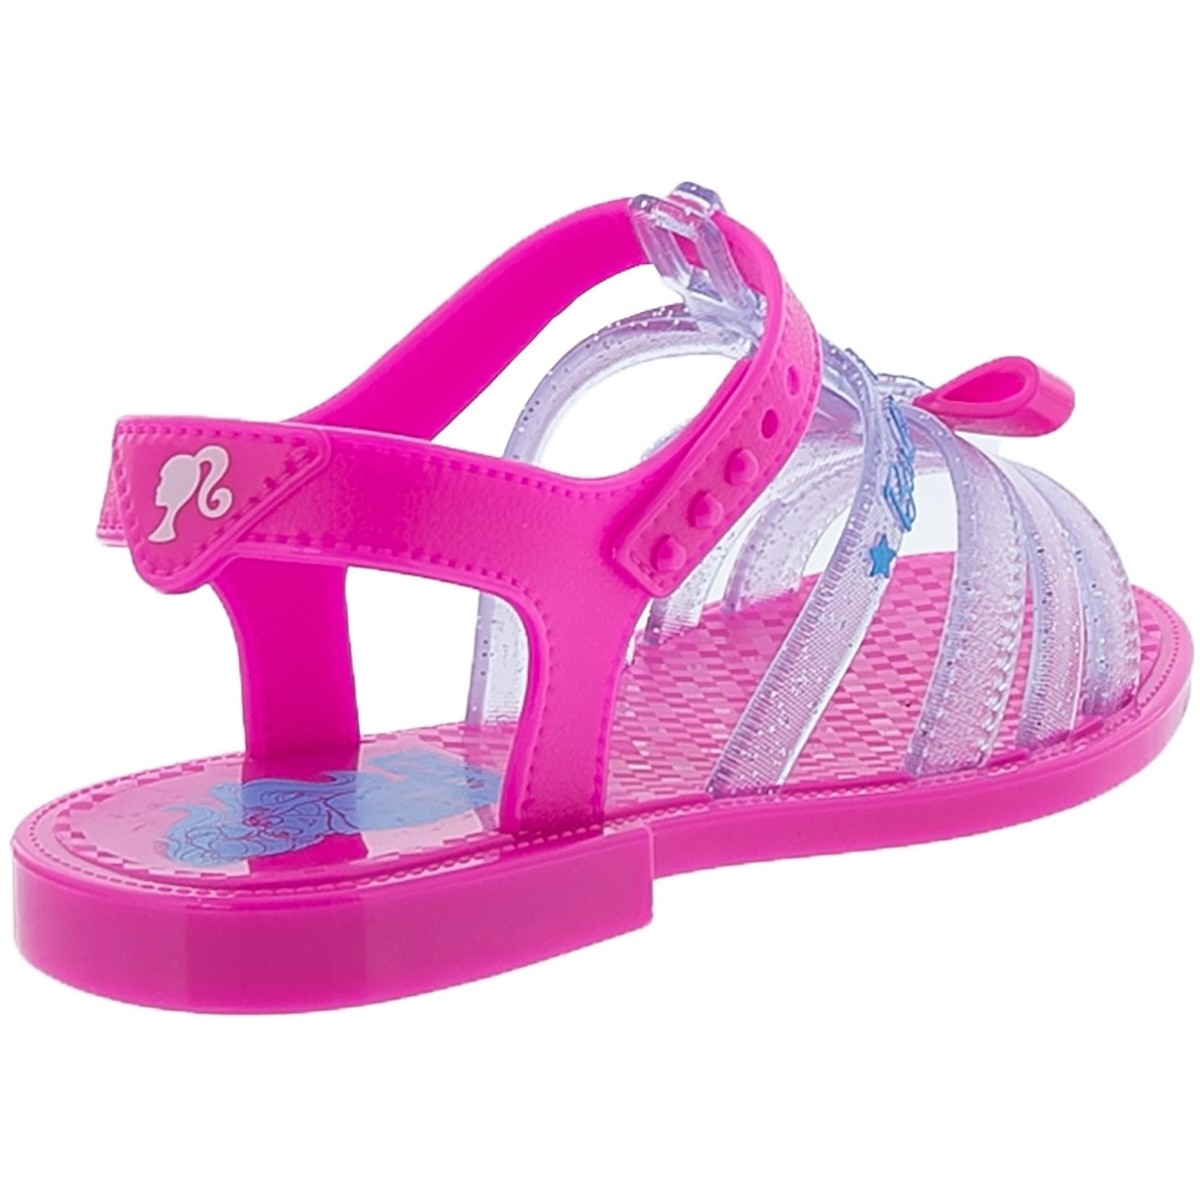 Sandalia Grendene Infantil Carro da Barbie